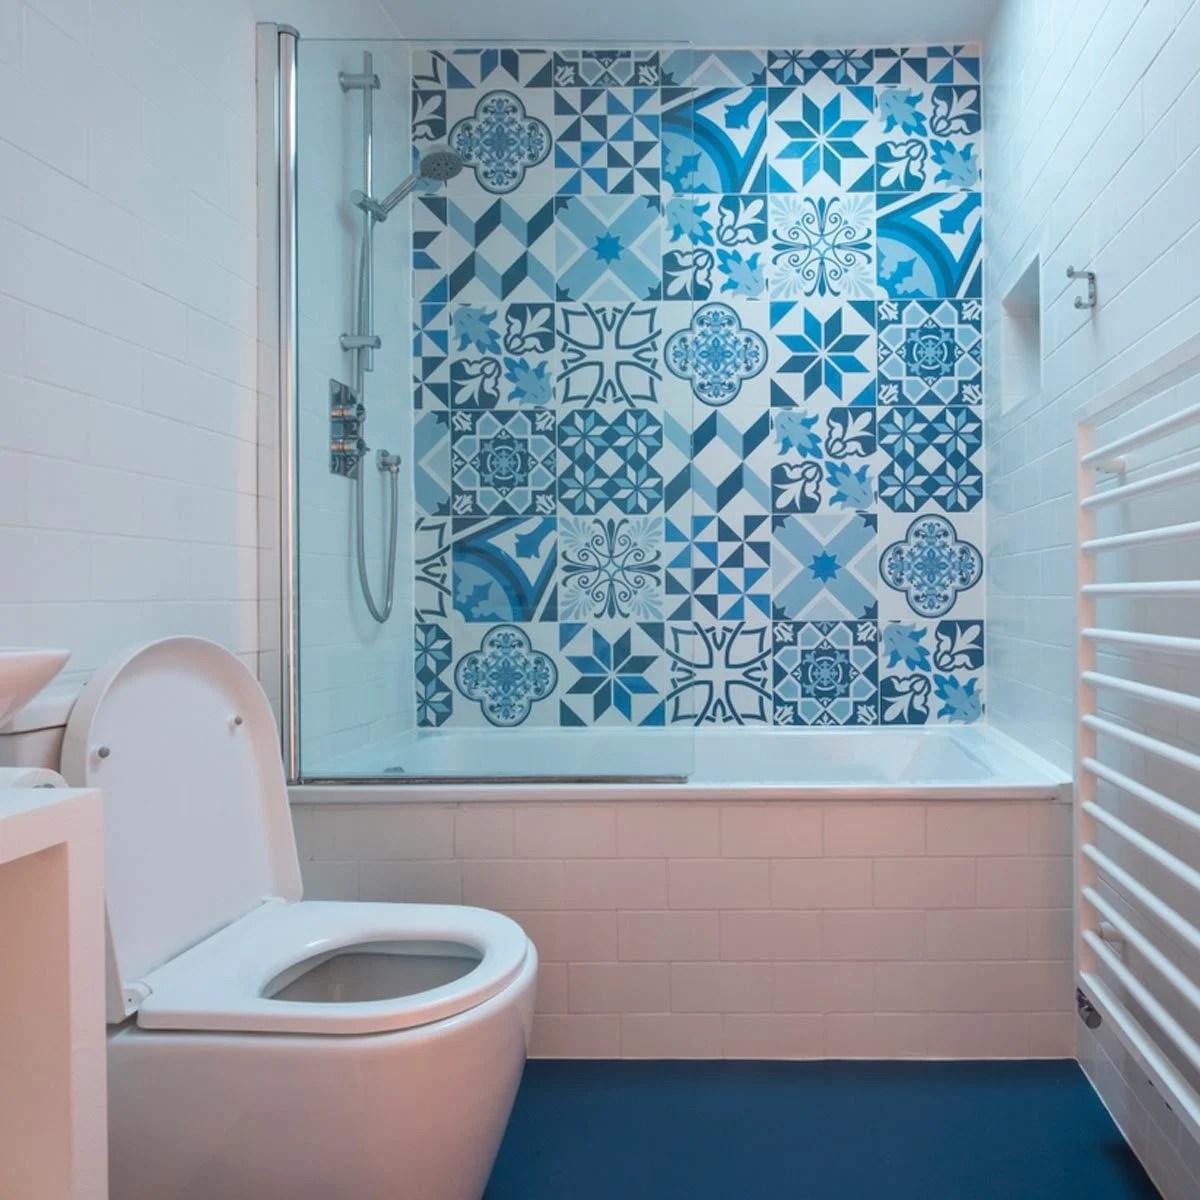 10 Genius Small Master Bathroom Ideas that WOW!   Family ... on Small Space Small Bathroom Ideas Uk id=81894